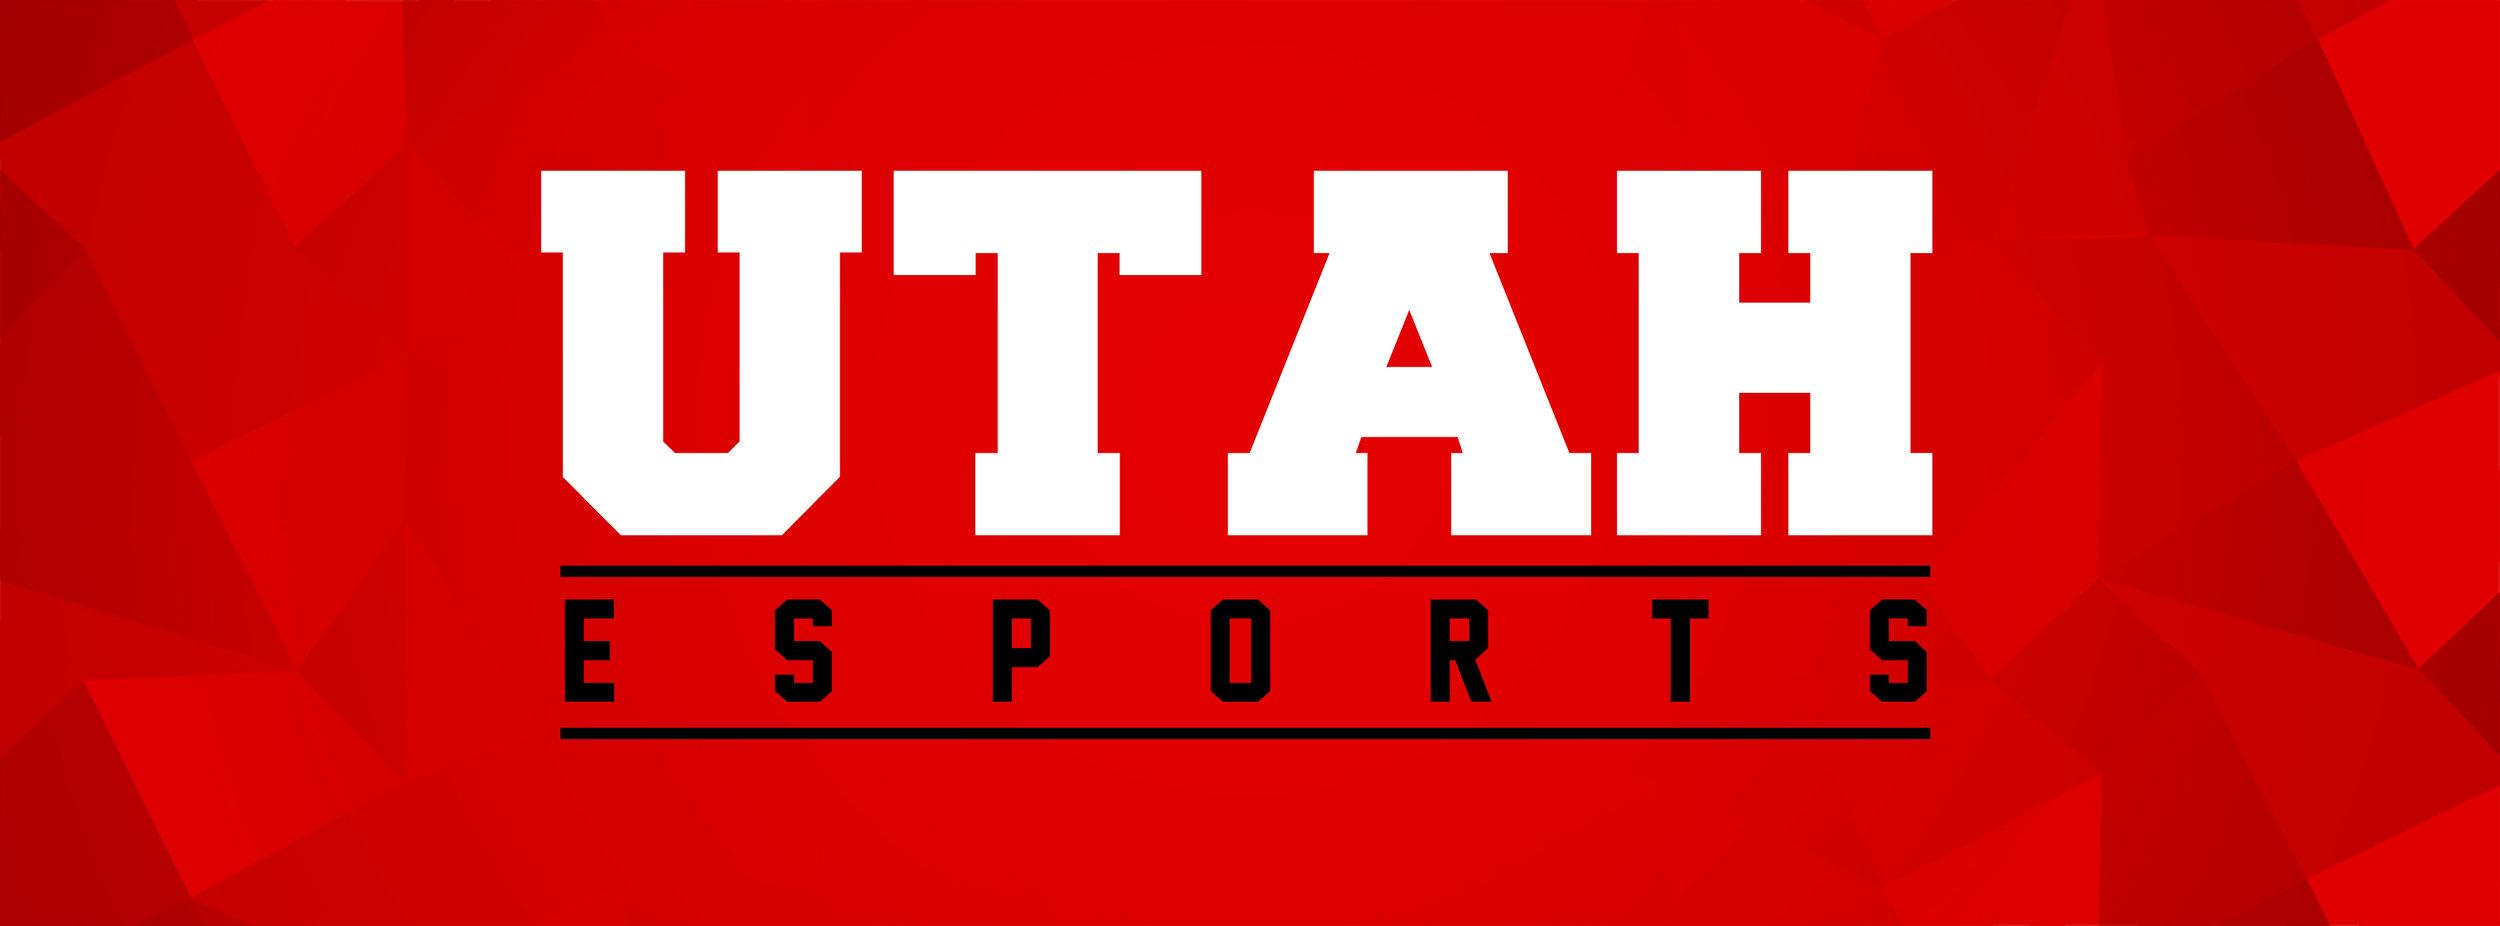 University of Utah eSports (Photo: University of Utah)